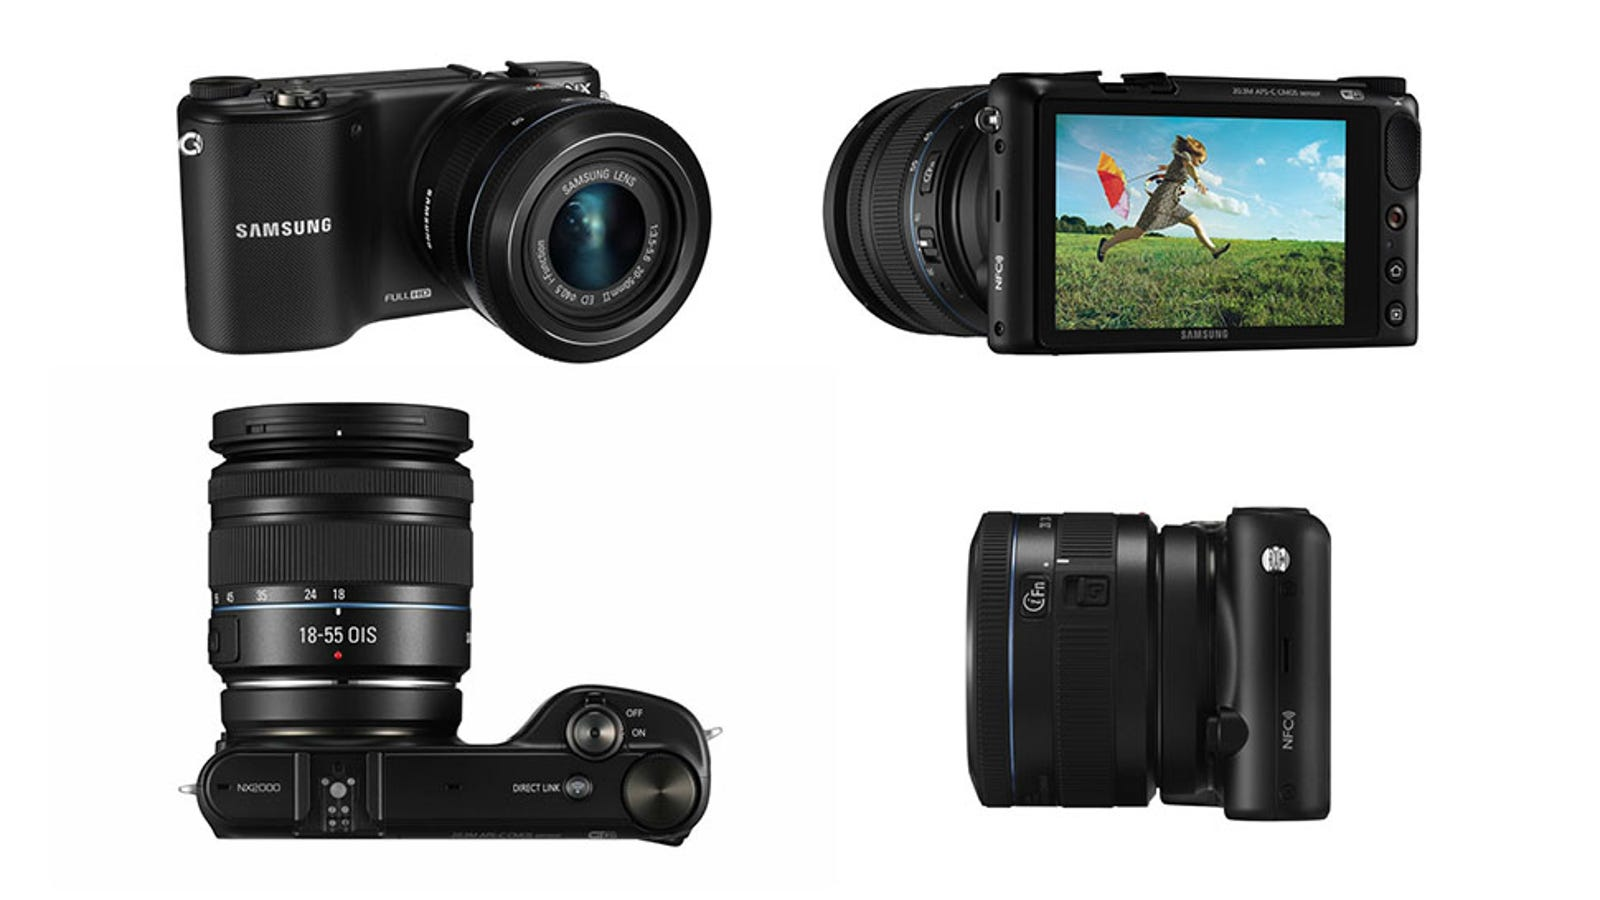 Samsung NX2000: A Fancy Camera That's Dumb Like a Smartphone